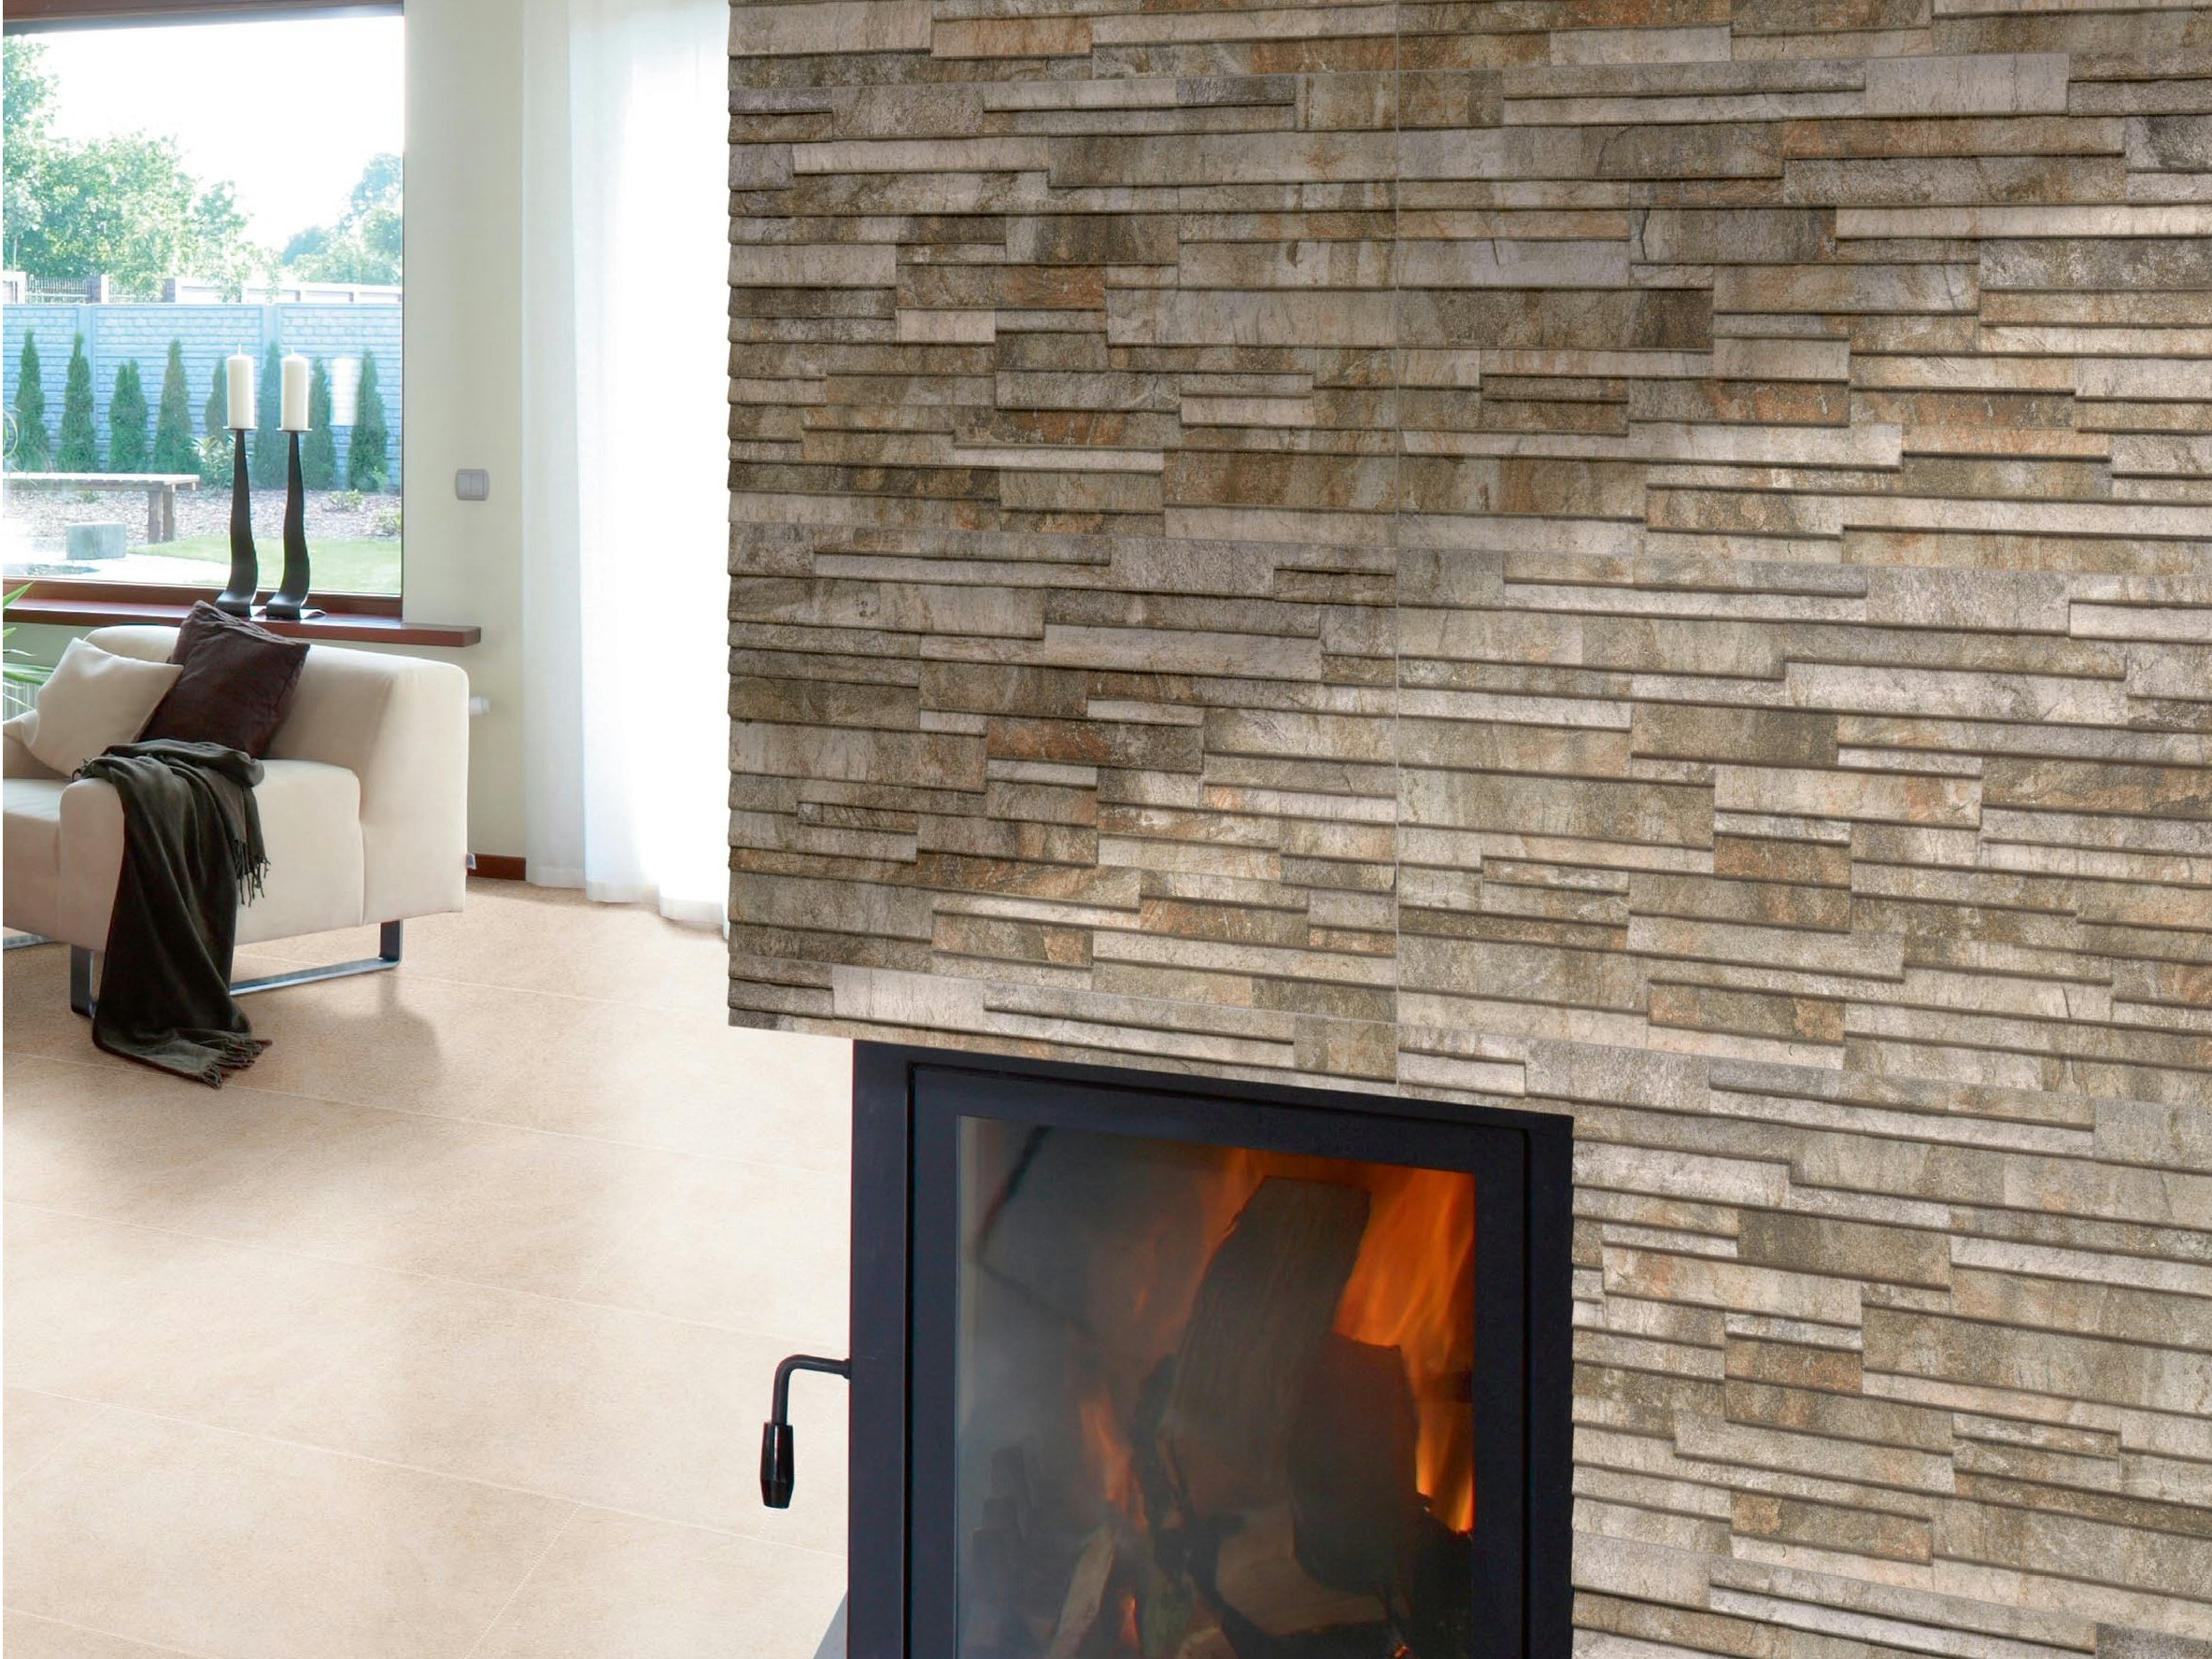 Revestimiento exterior para paredes materiales de - Revestir paredes exteriores ...